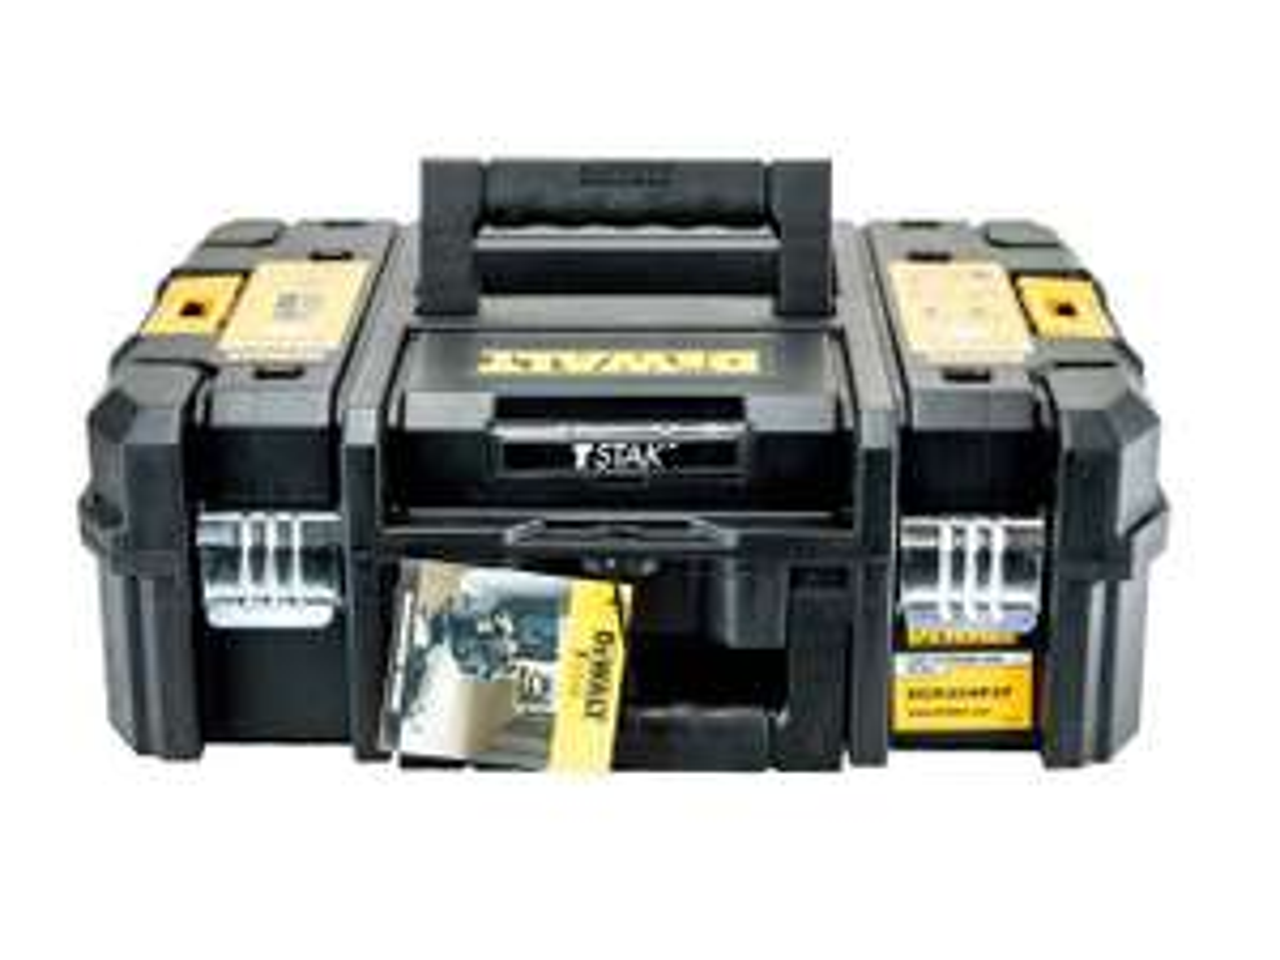 DeWalt DEW170703 T-STAK II Twin Tool Case Empty £17.95 inc delivery @ FFX